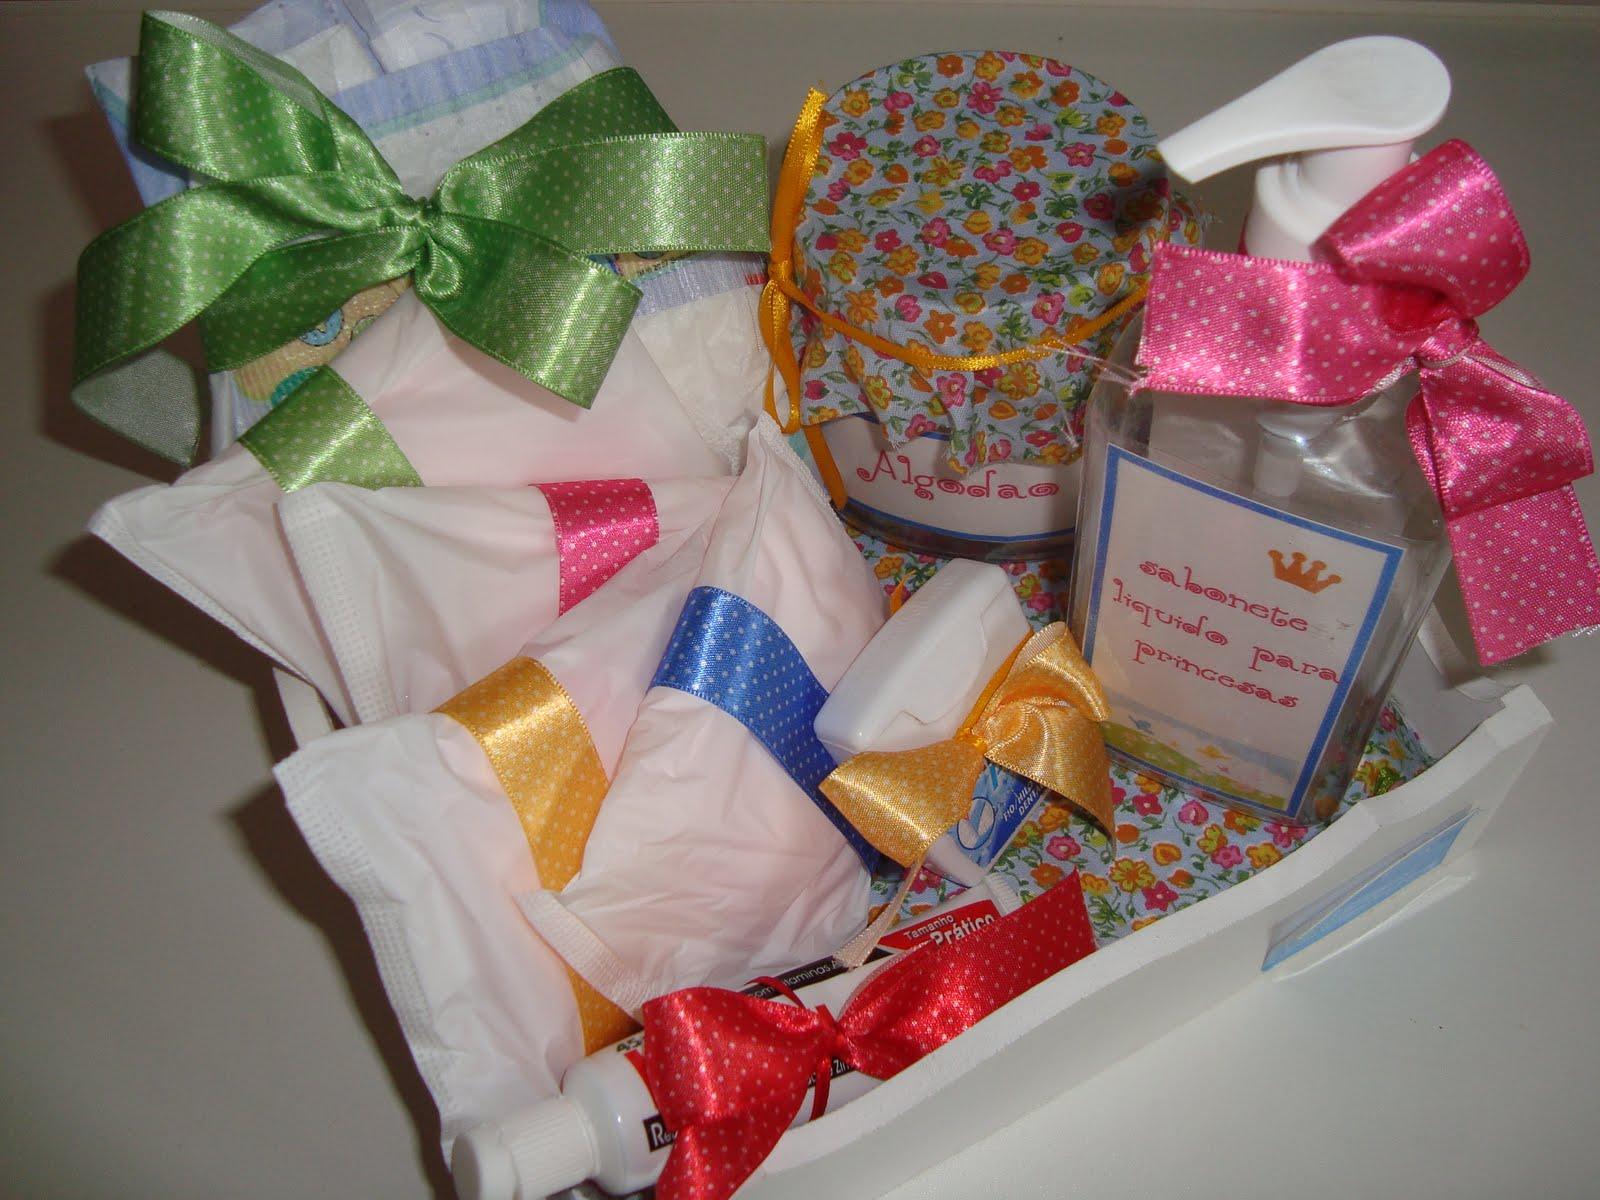 Festa Perfeita Novembro 2009 -> Kit Banheiro Feminino